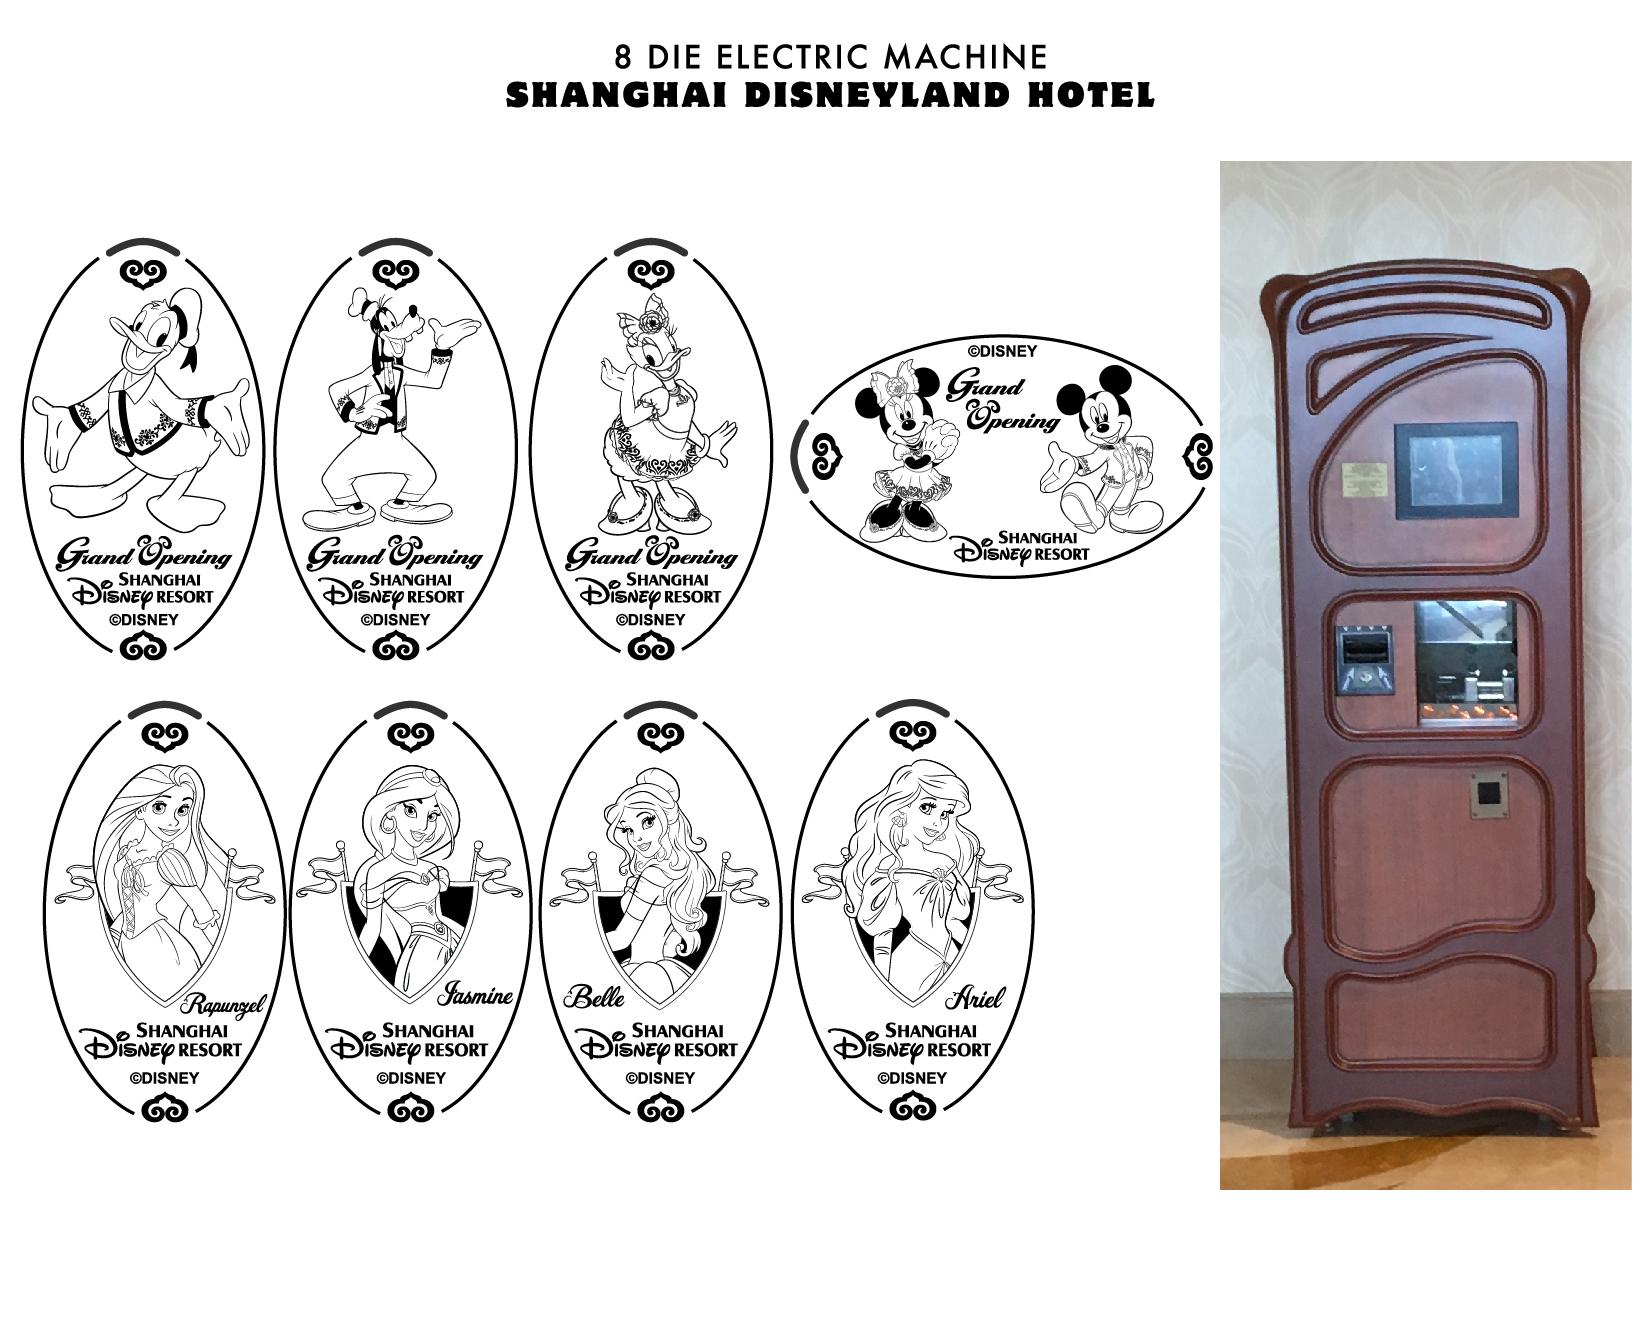 Shanghai Disney Resort Pressed Coin Guide